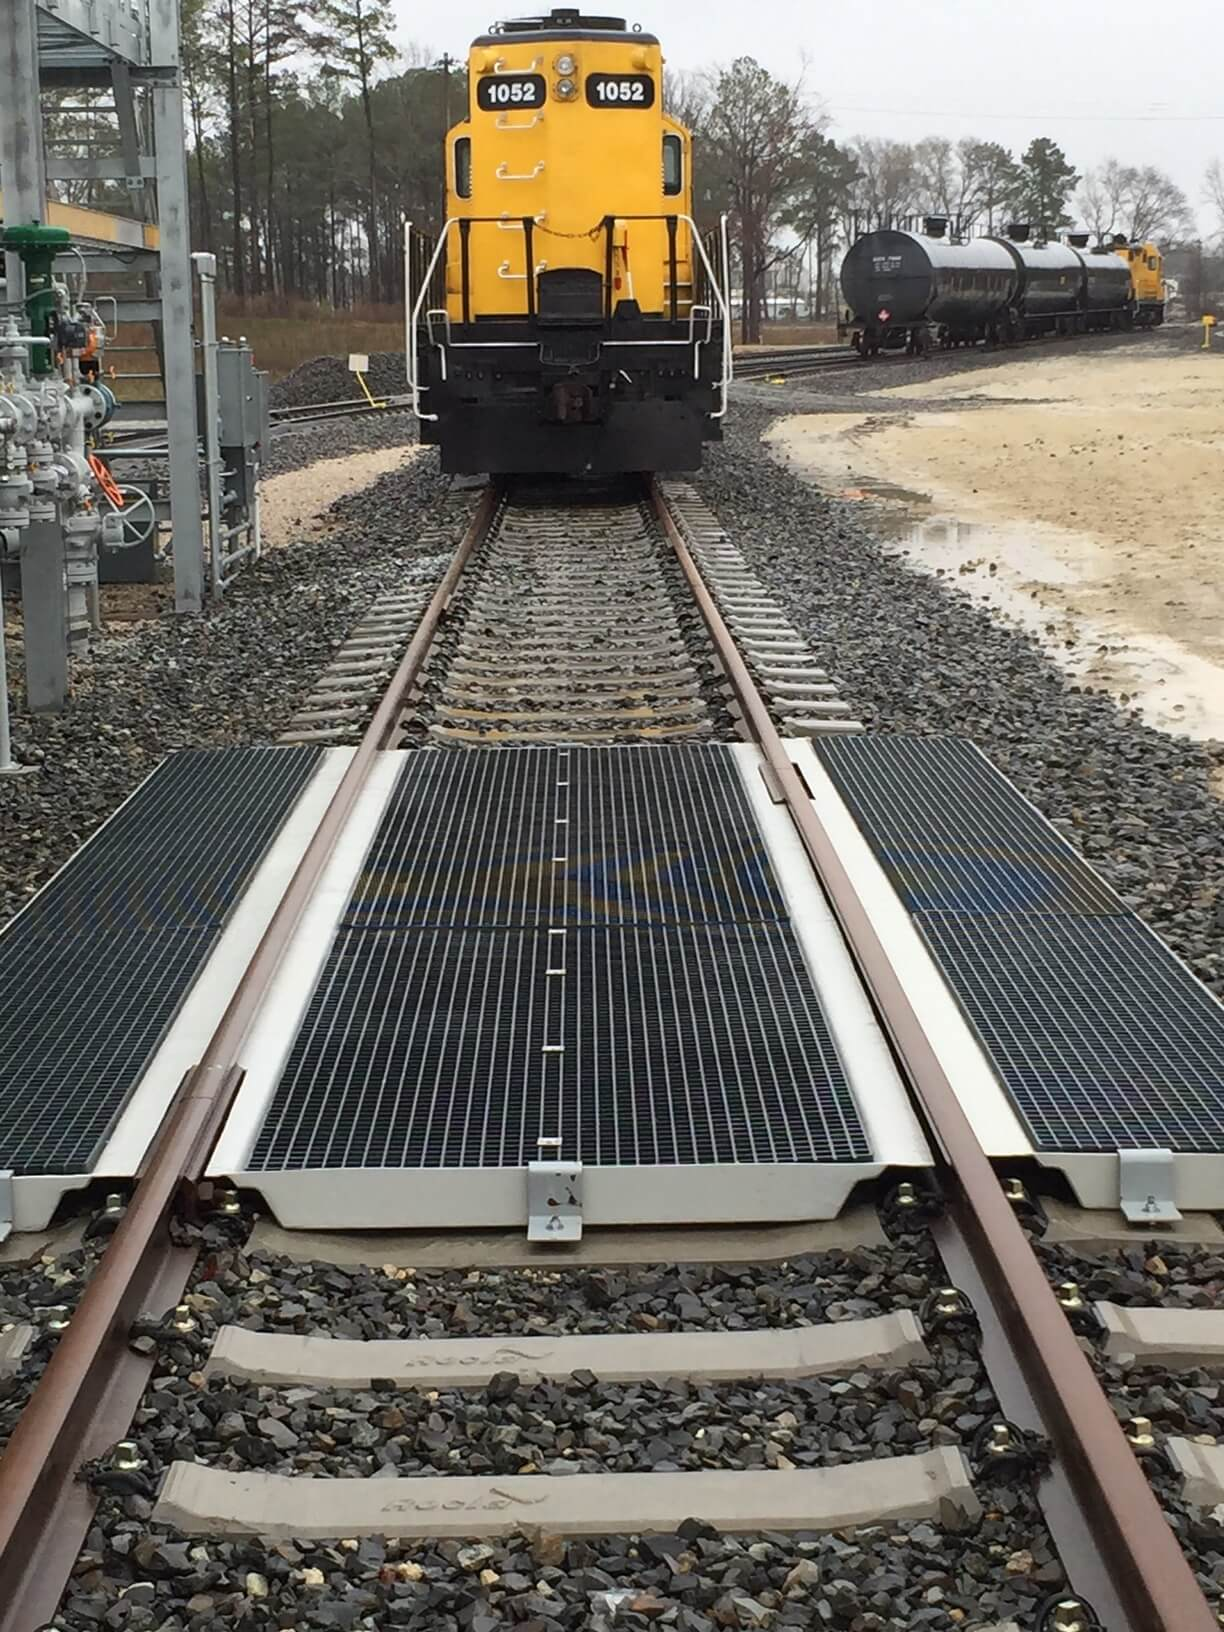 Polystar Containment Star Track fiberglass track pans with pedestrian fiberglass grating